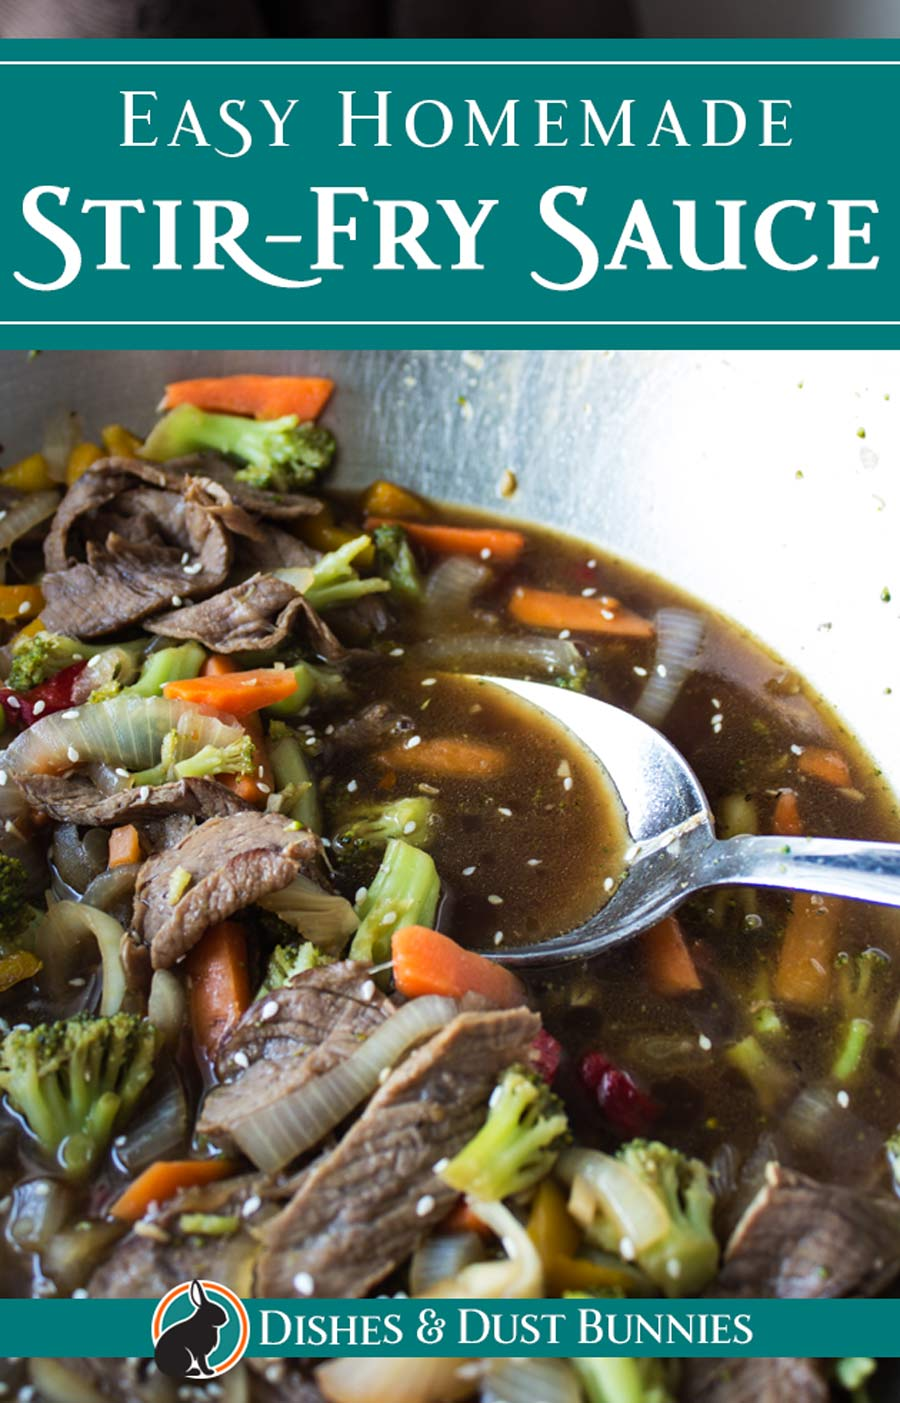 Easy Homemade Stir Fry Sauce via @mvdustbunnies